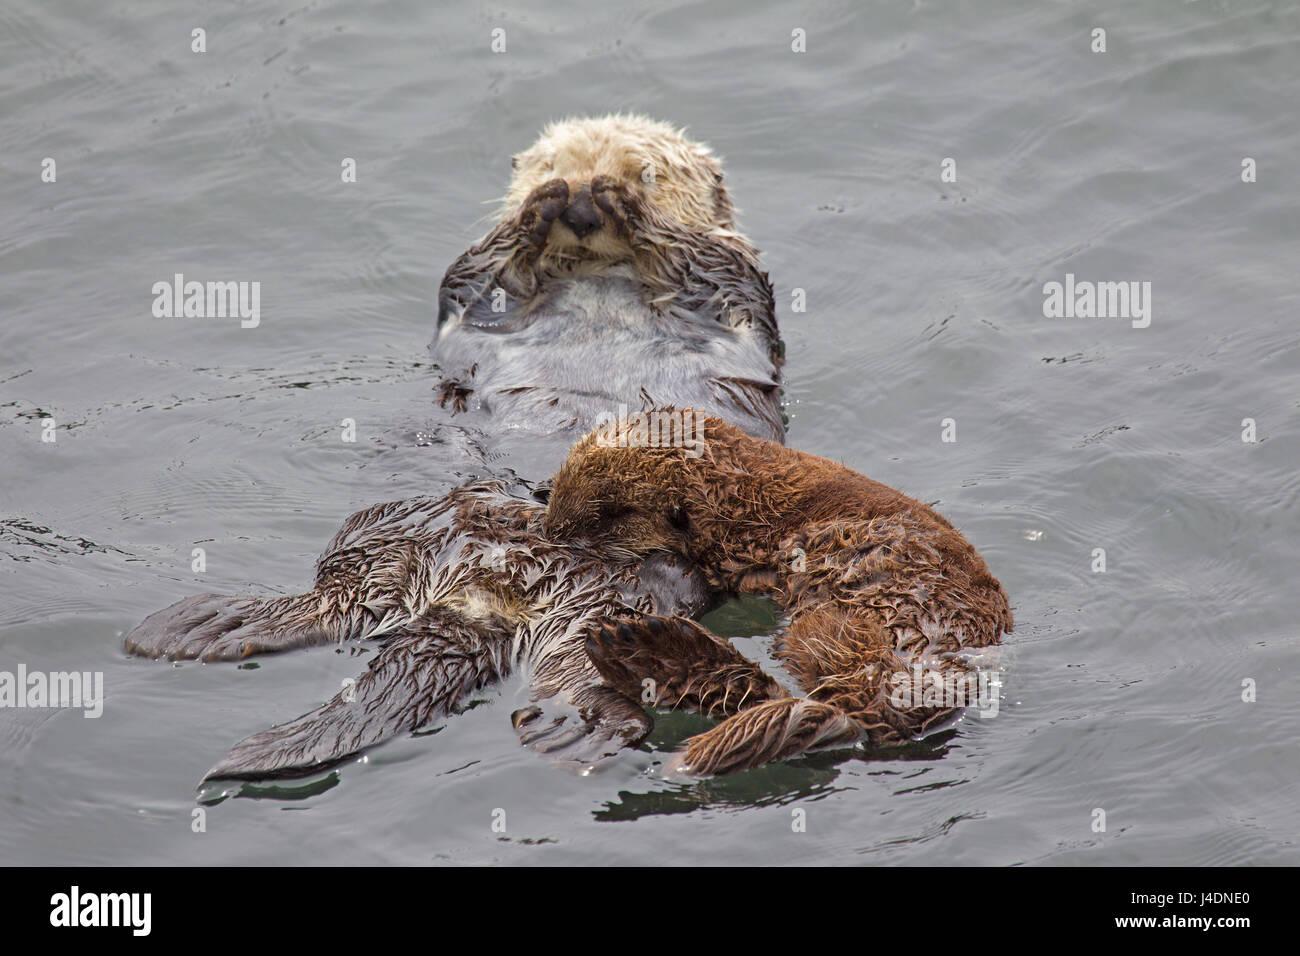 Sea Otter Pup Nursing - Stock Image